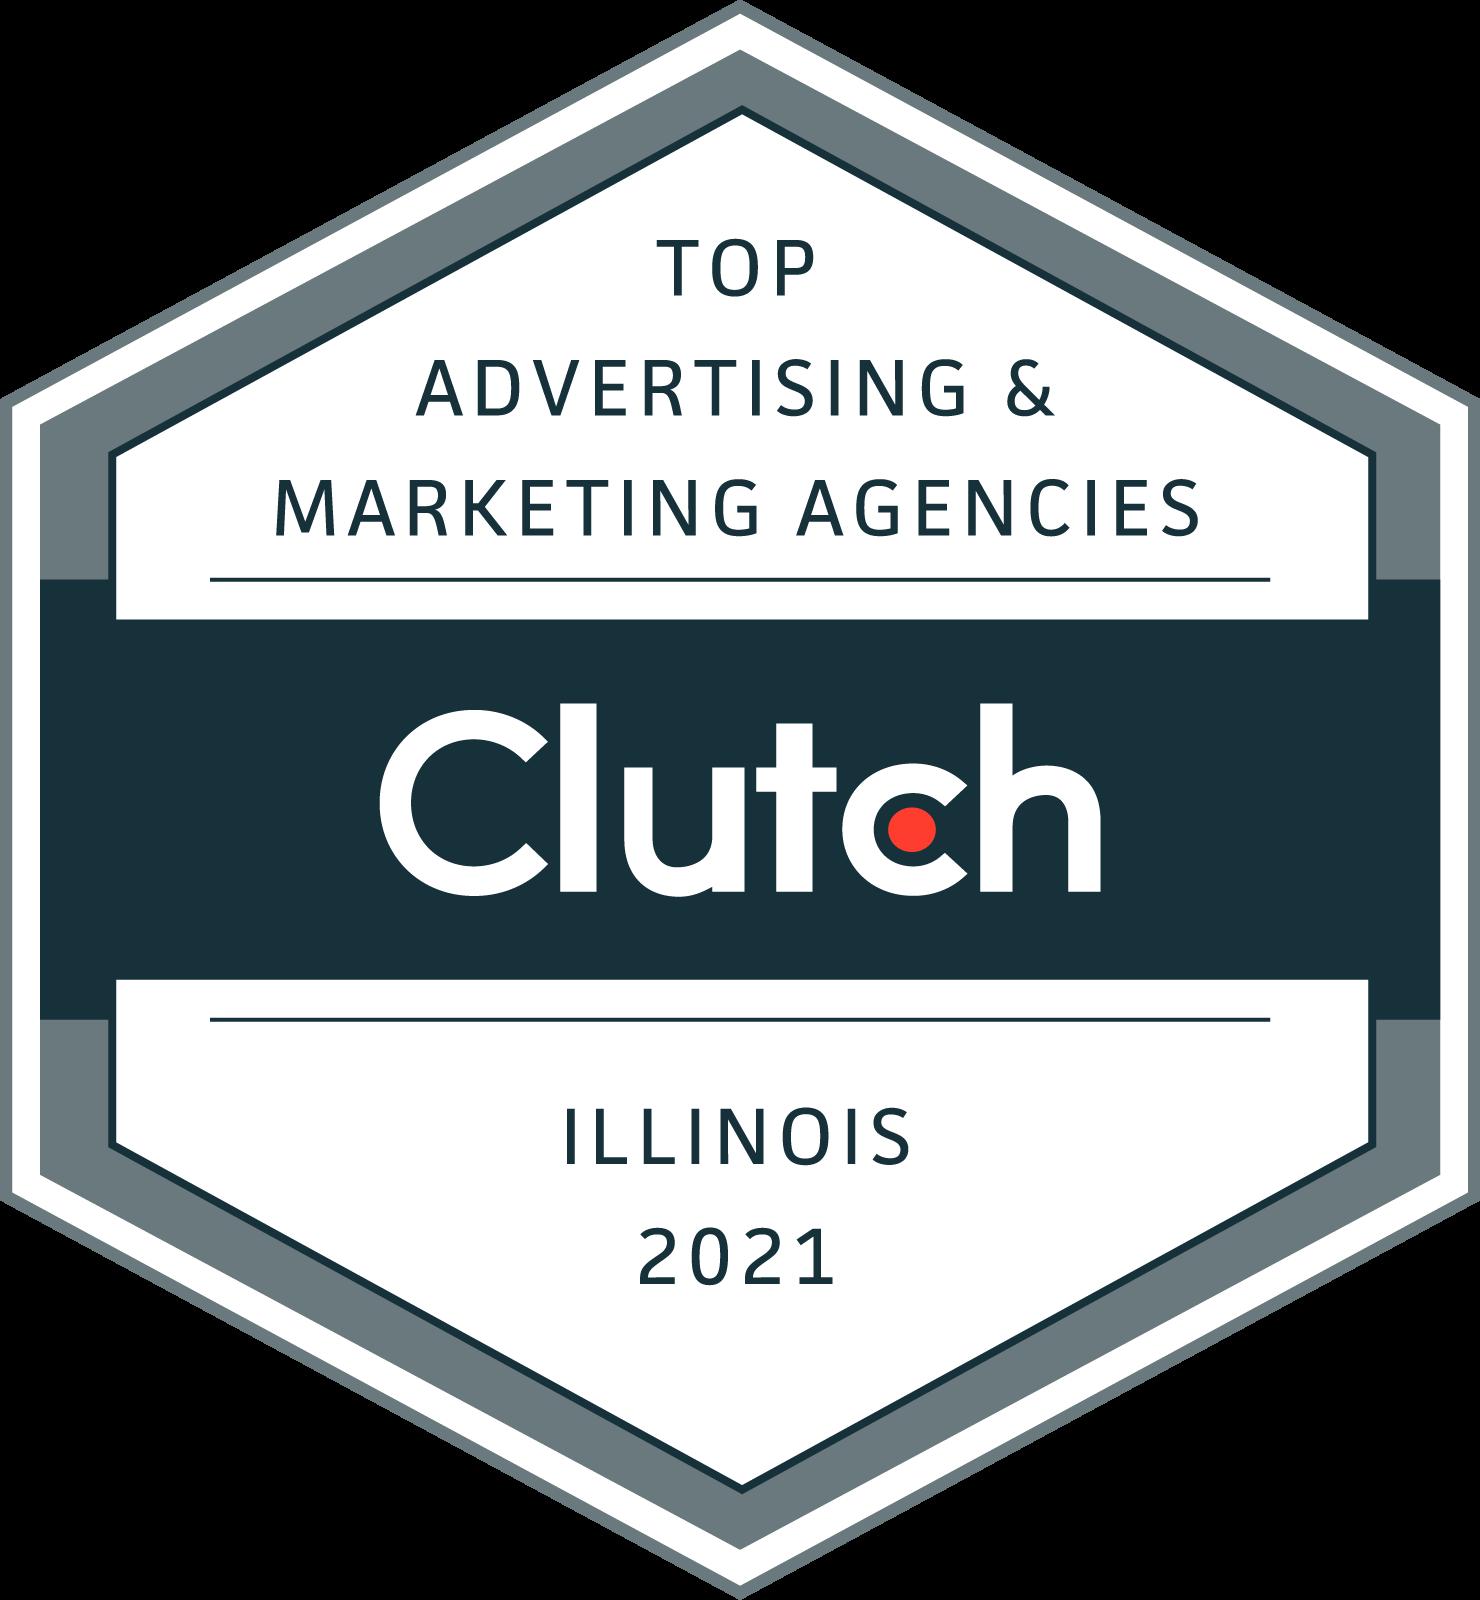 Advertising_Marketing_Agencies_Illinois_2021 (1)